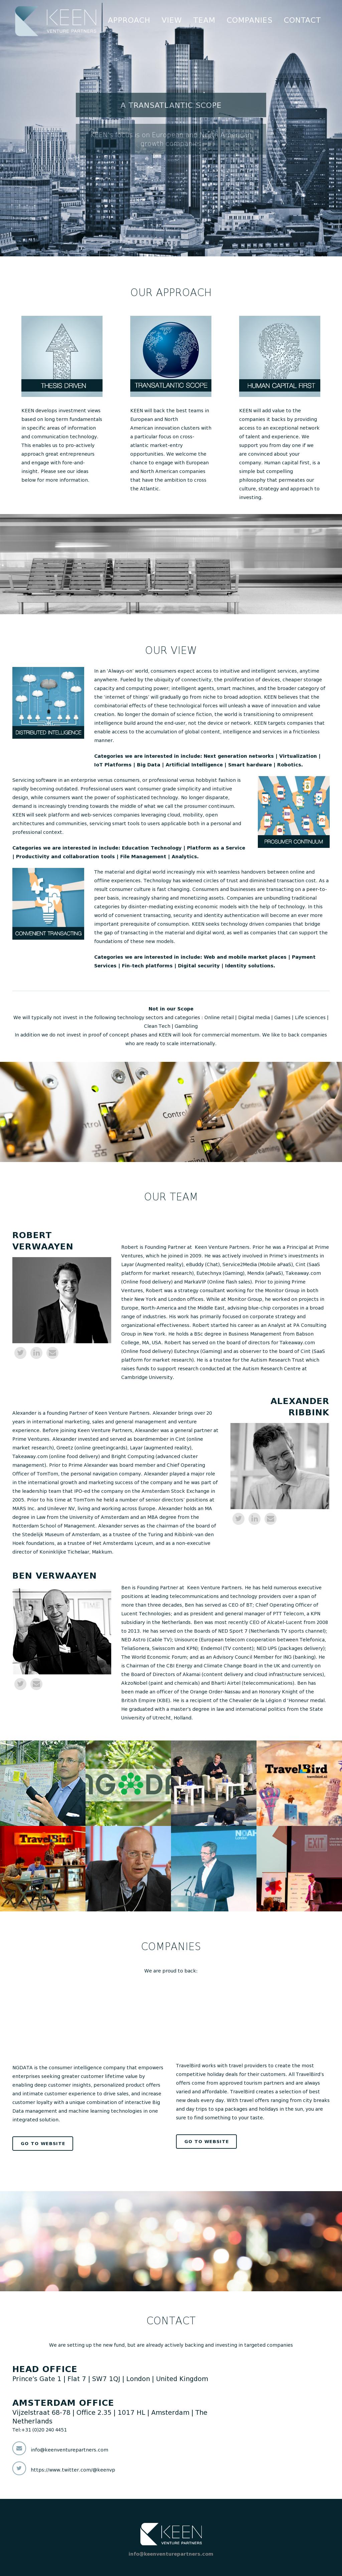 01e78e0ed0 Keen Venture Partners | Competitors, Revenue and Employees - Owler Company  Profile